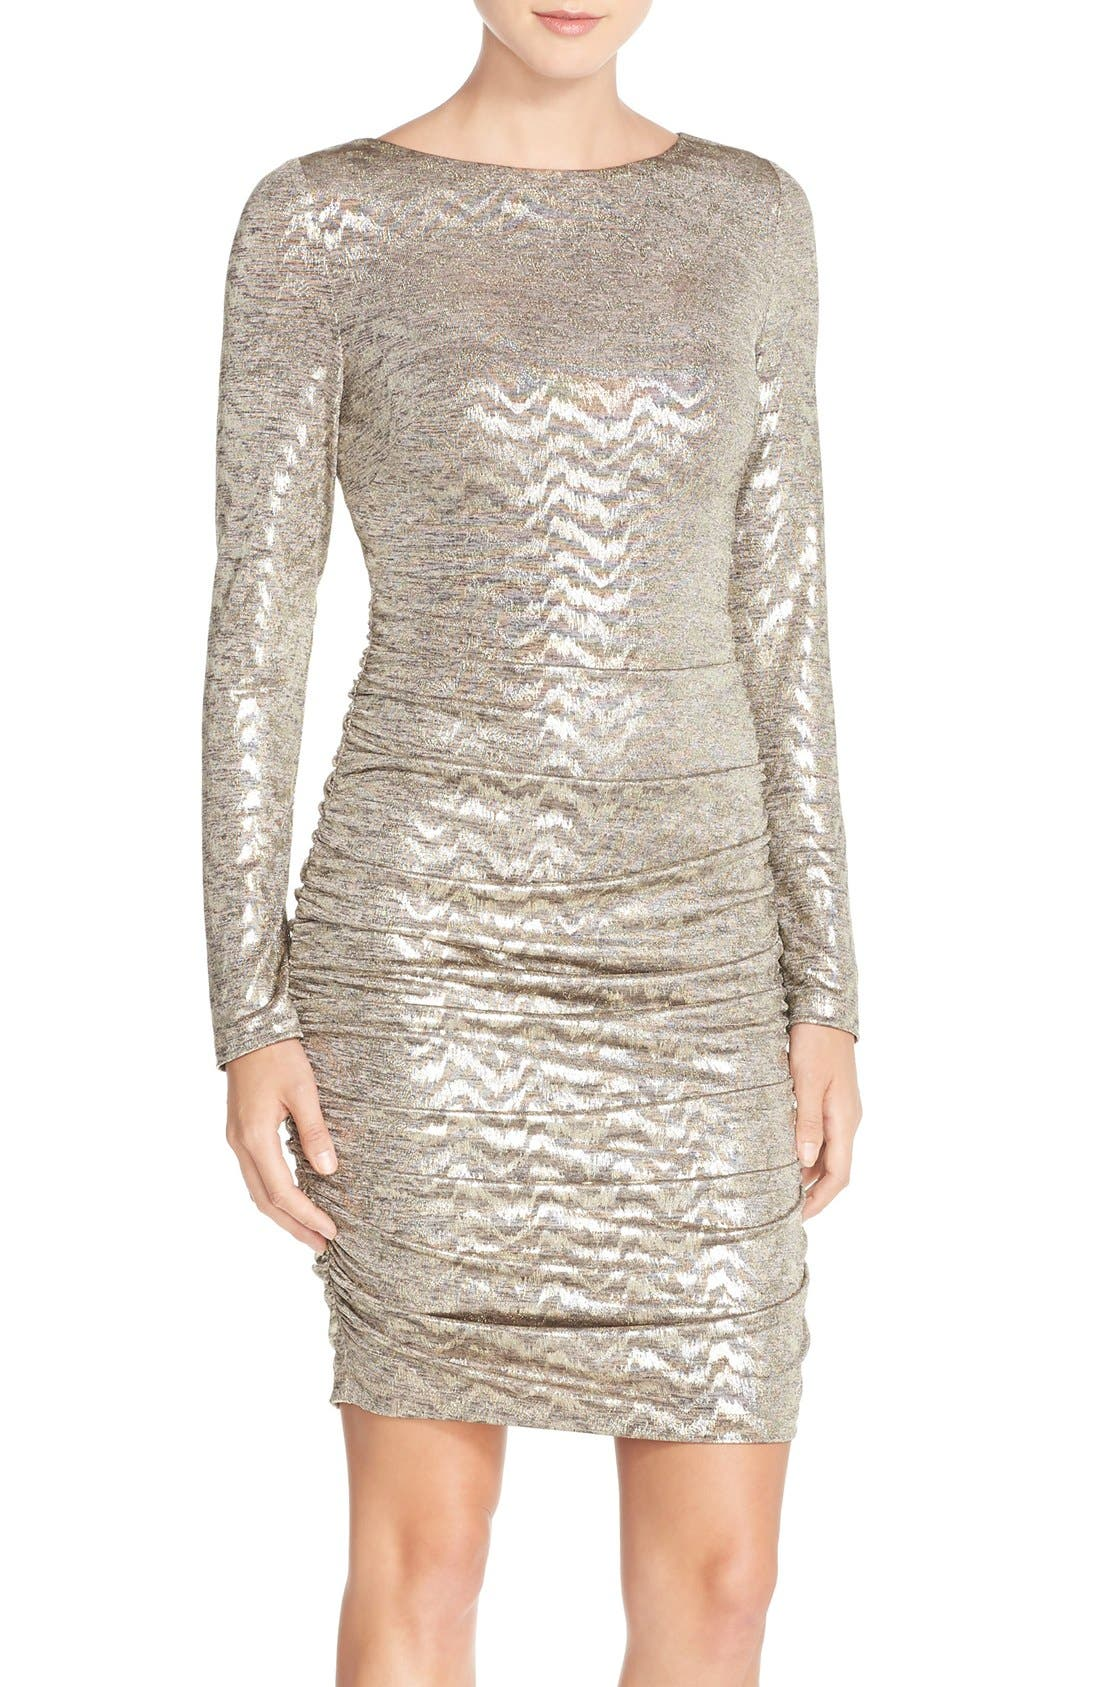 VINCE CAMUTO Metallic Jersey Body-Con Dress, Main, color, 710